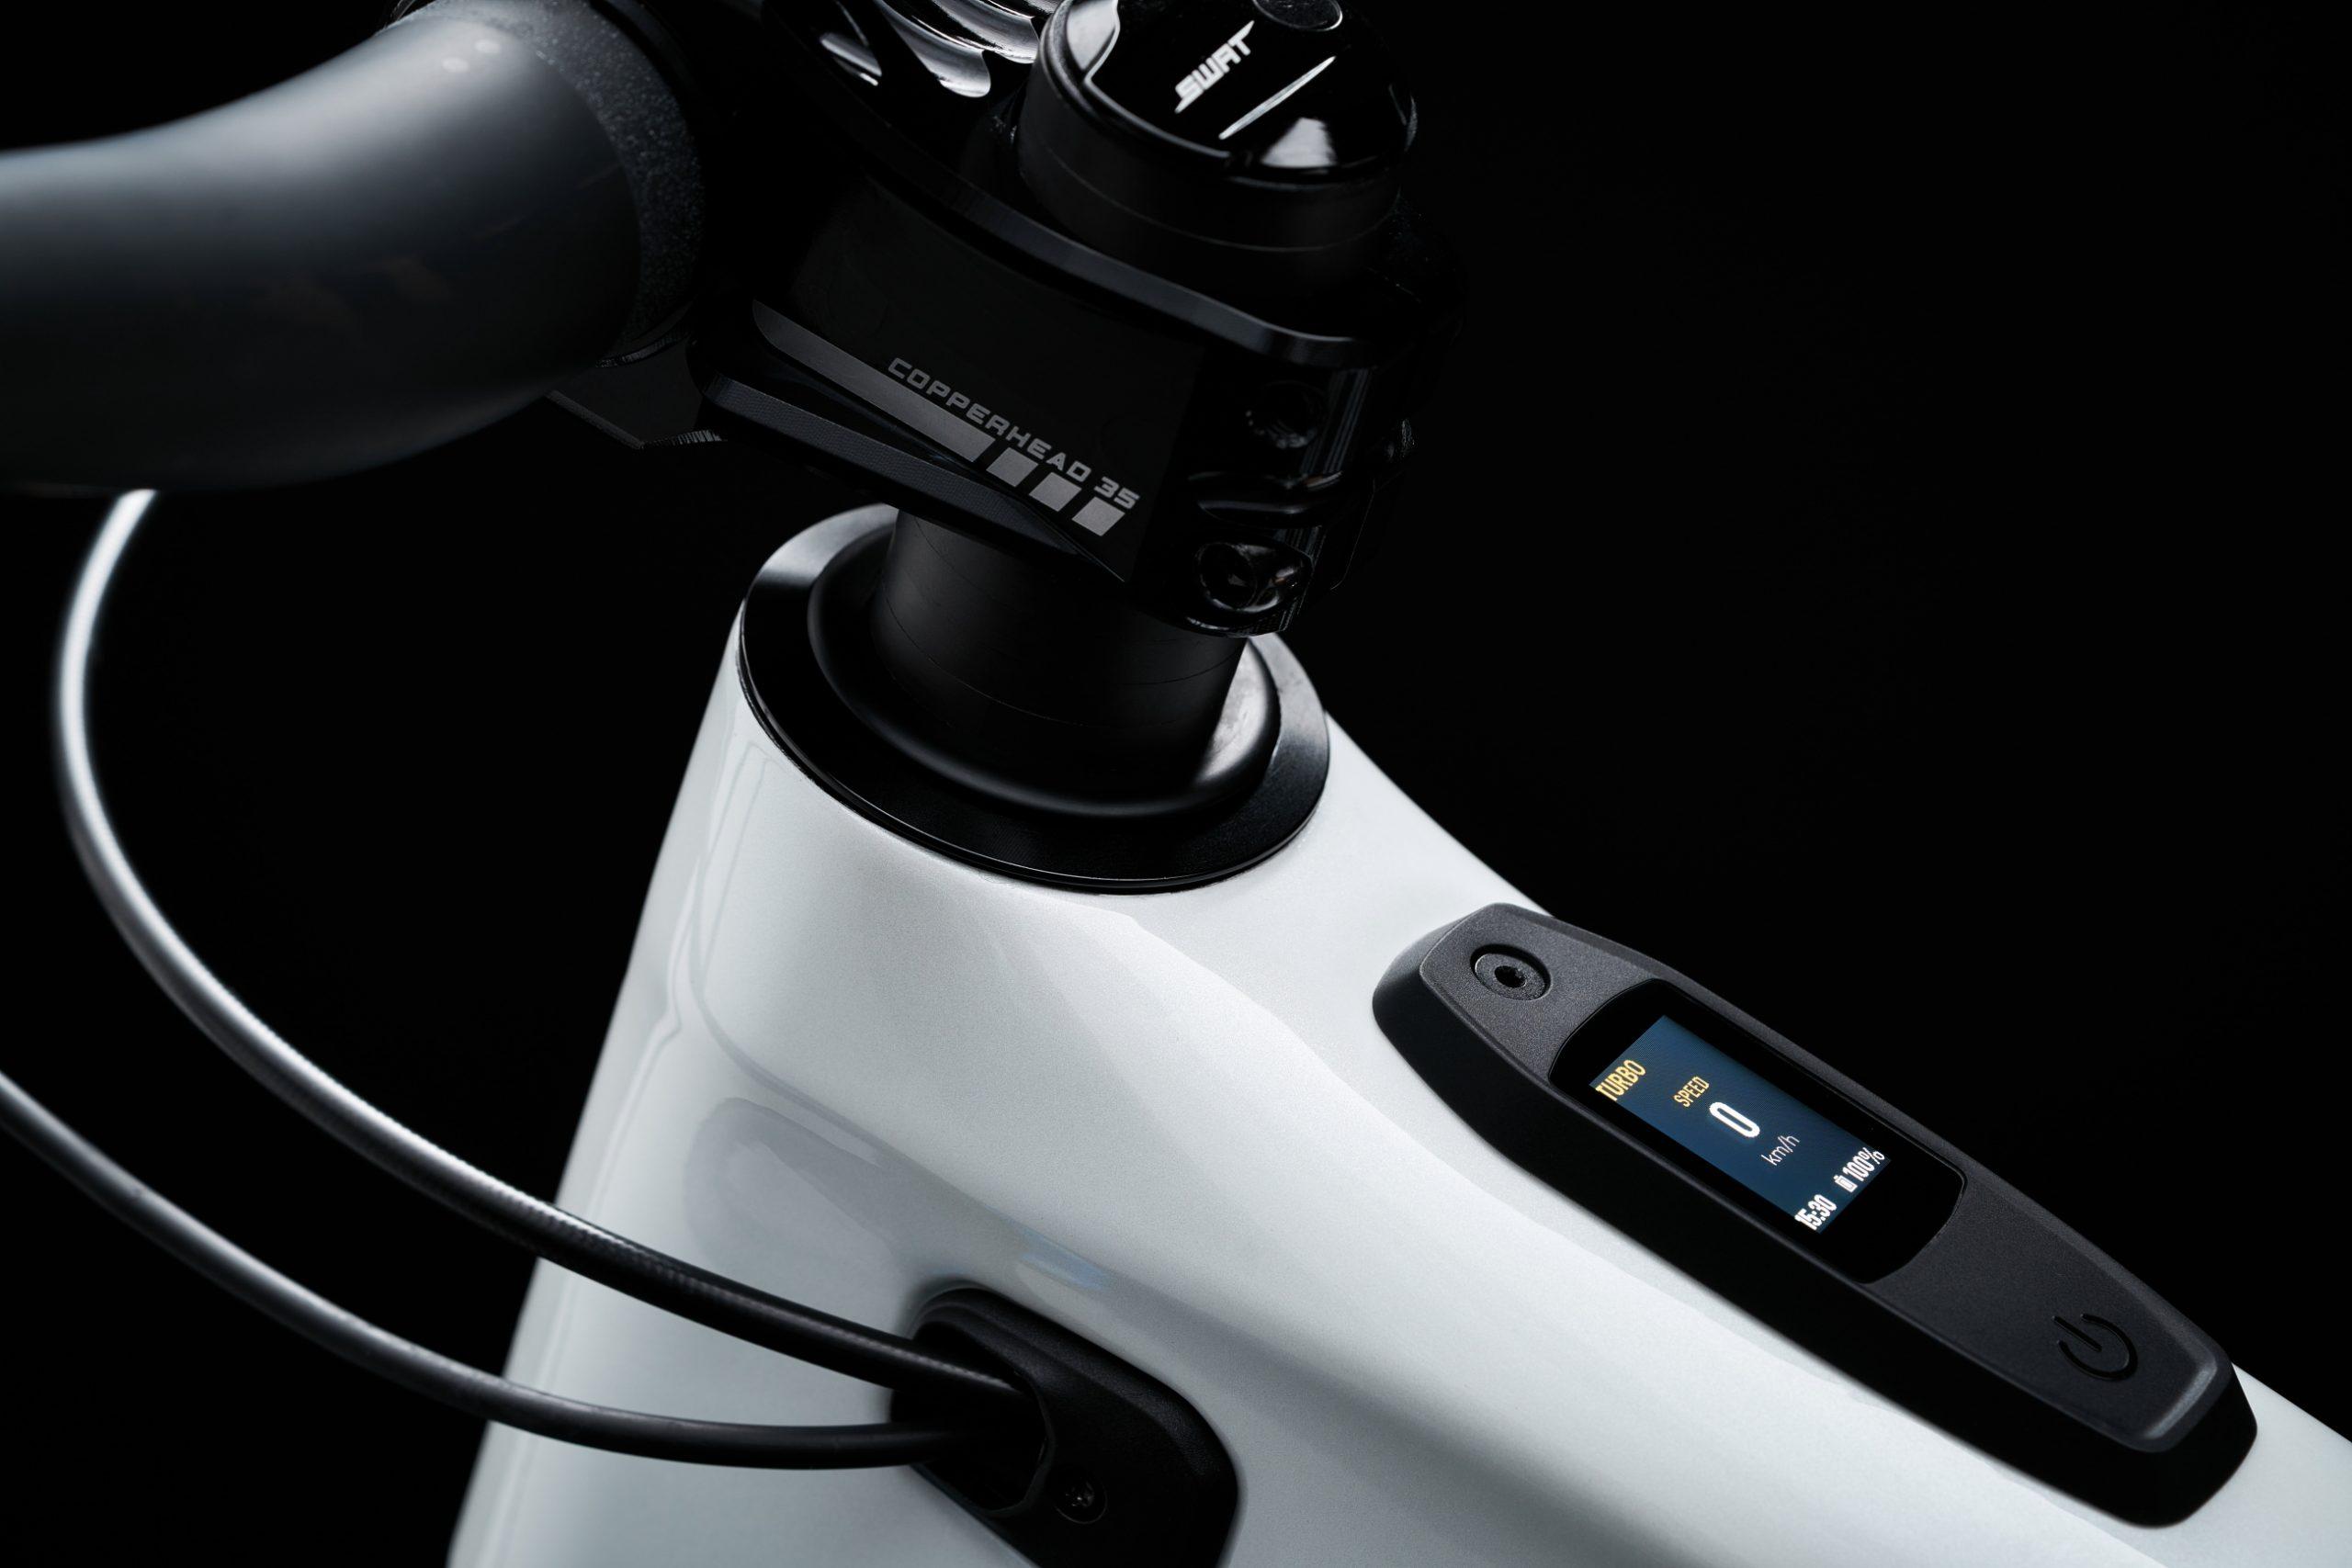 New Specialized Levo G3 2497 scaled Cycleholix